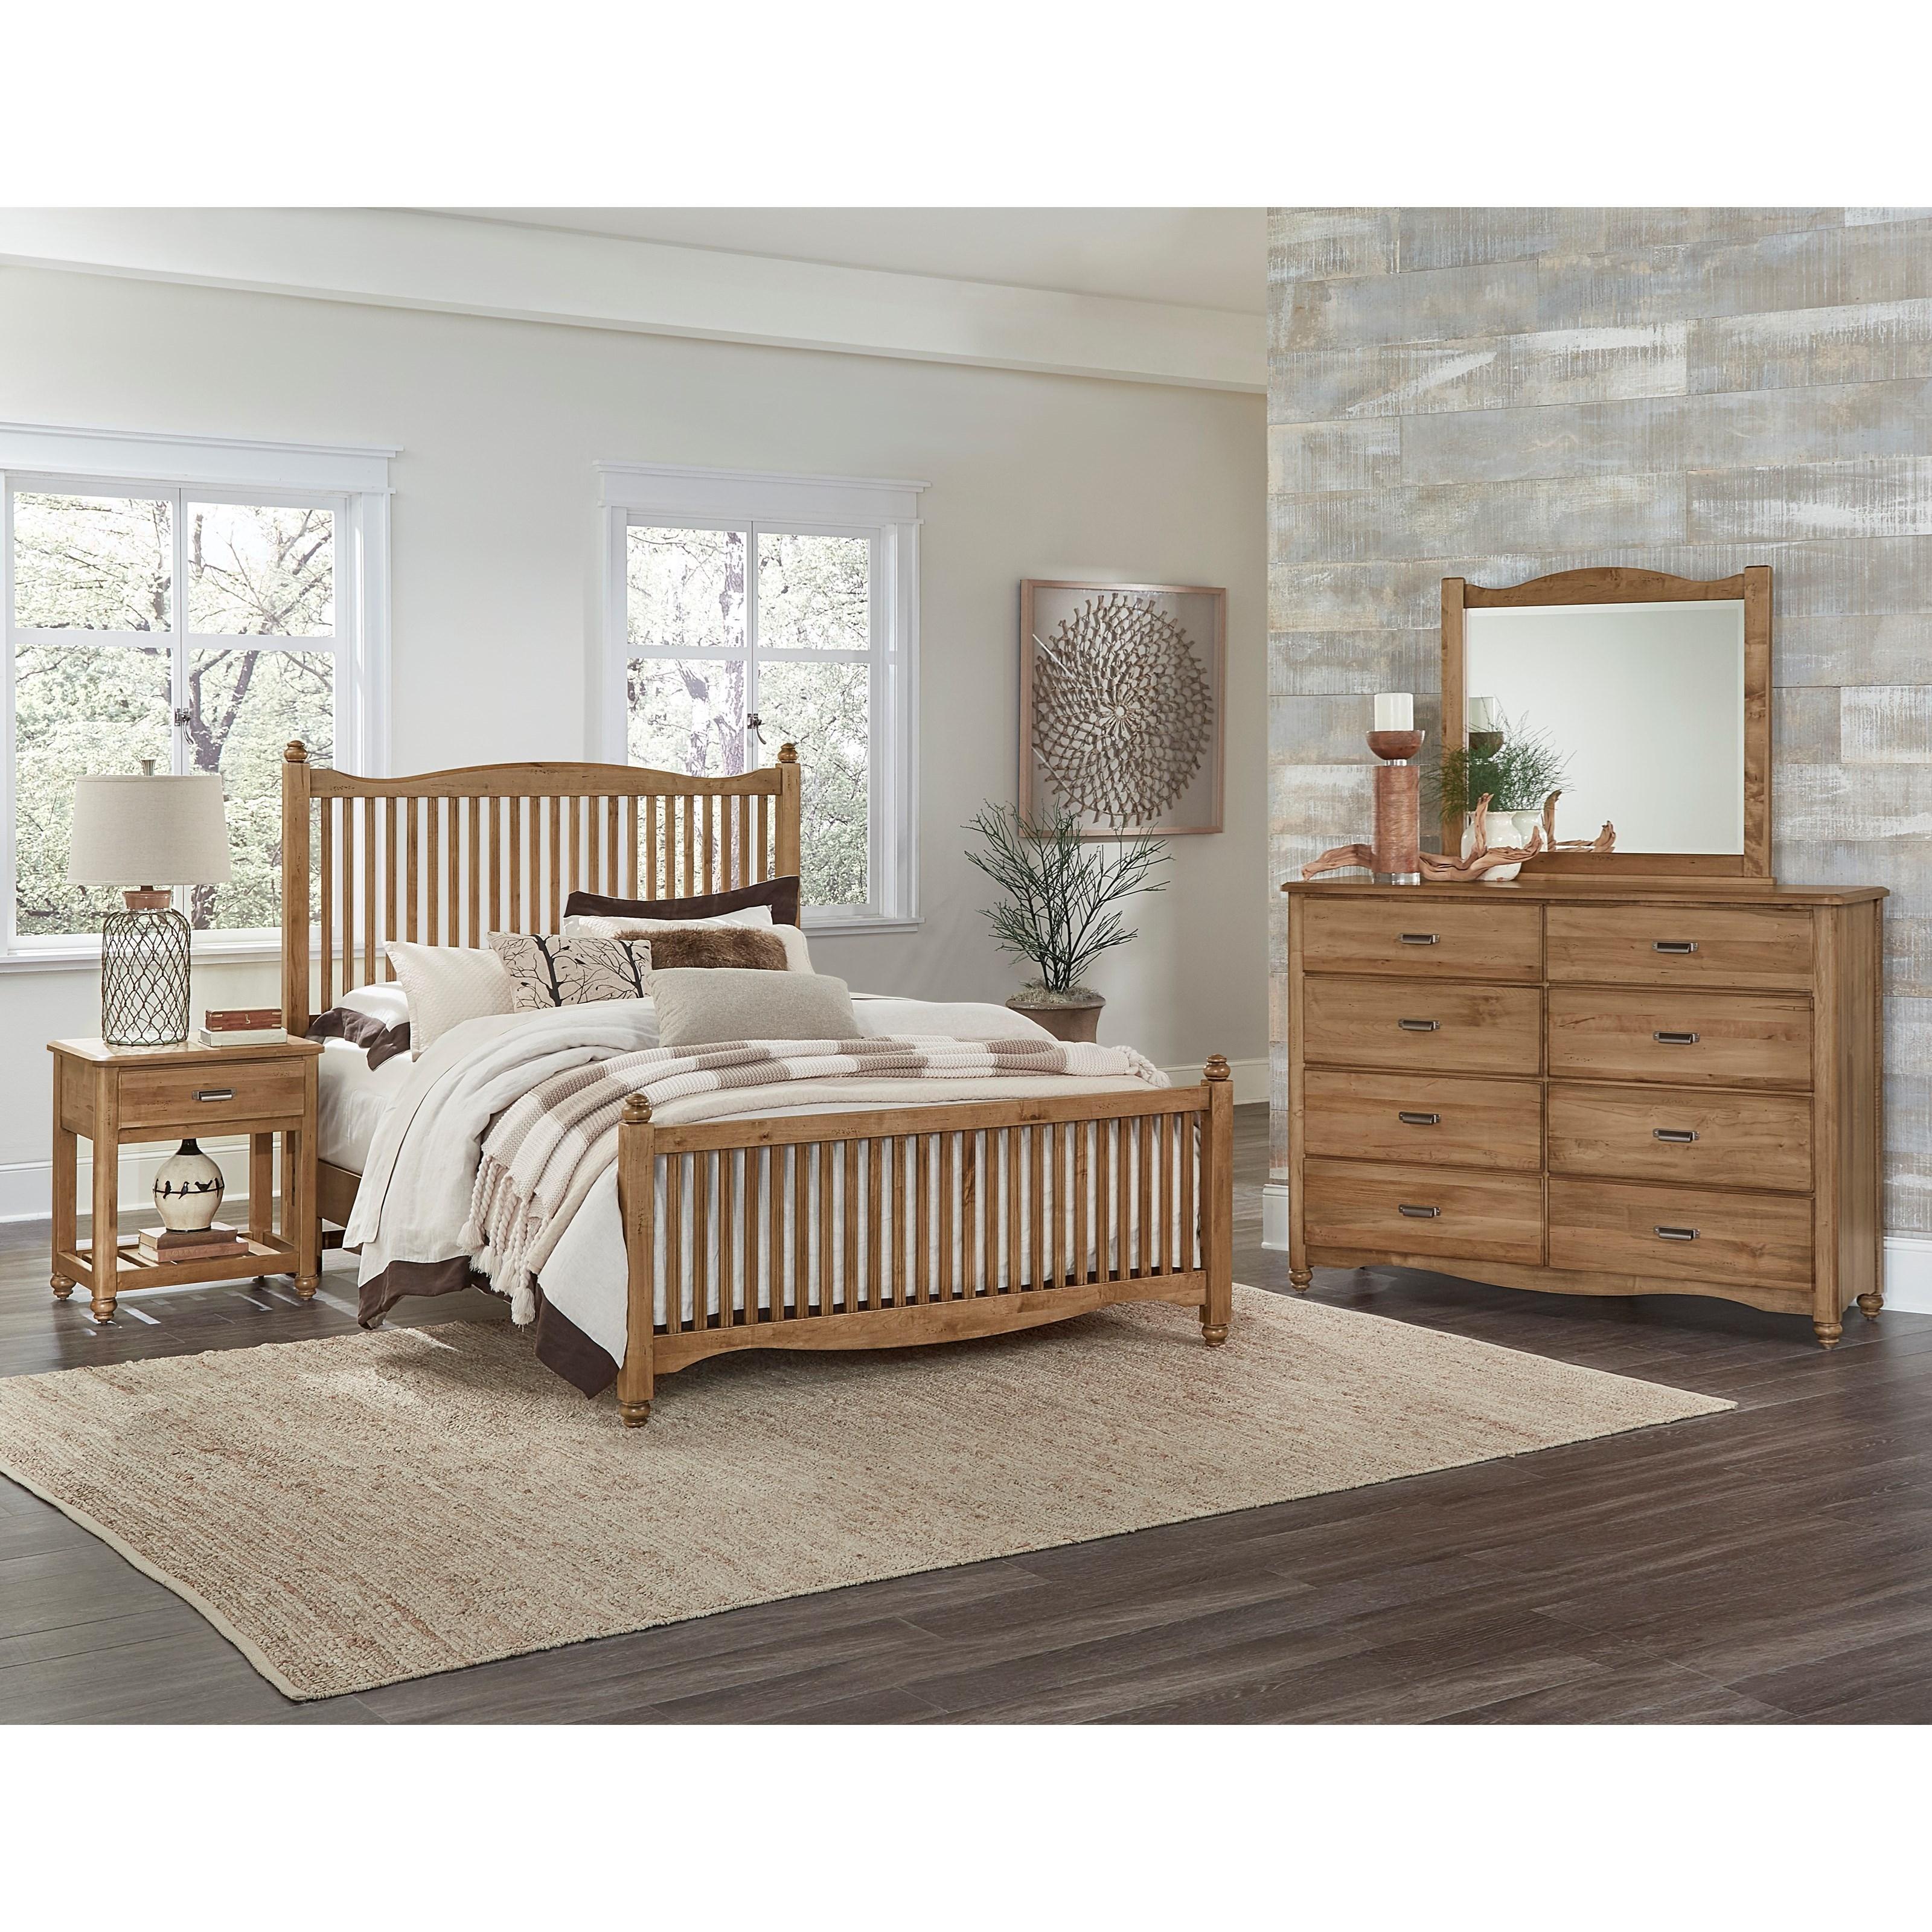 Vaughan Bassett American Maple Full Bedroom Group - Item Number: 402 F Bedroom Group 1